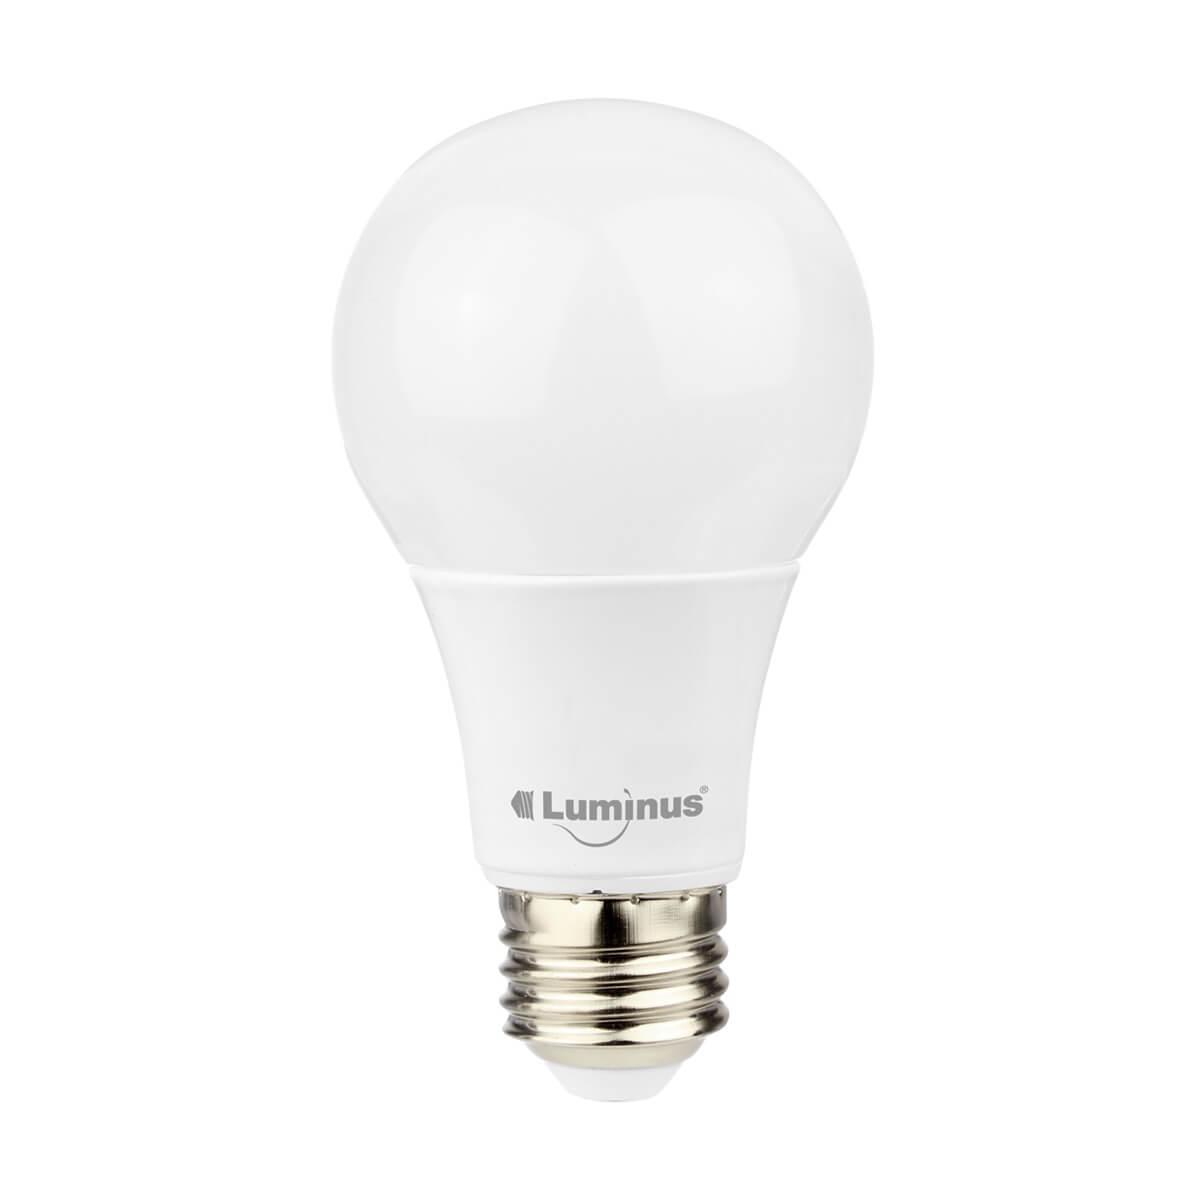 Luminus LED 9W 2700K A19 ND - 2 Pack